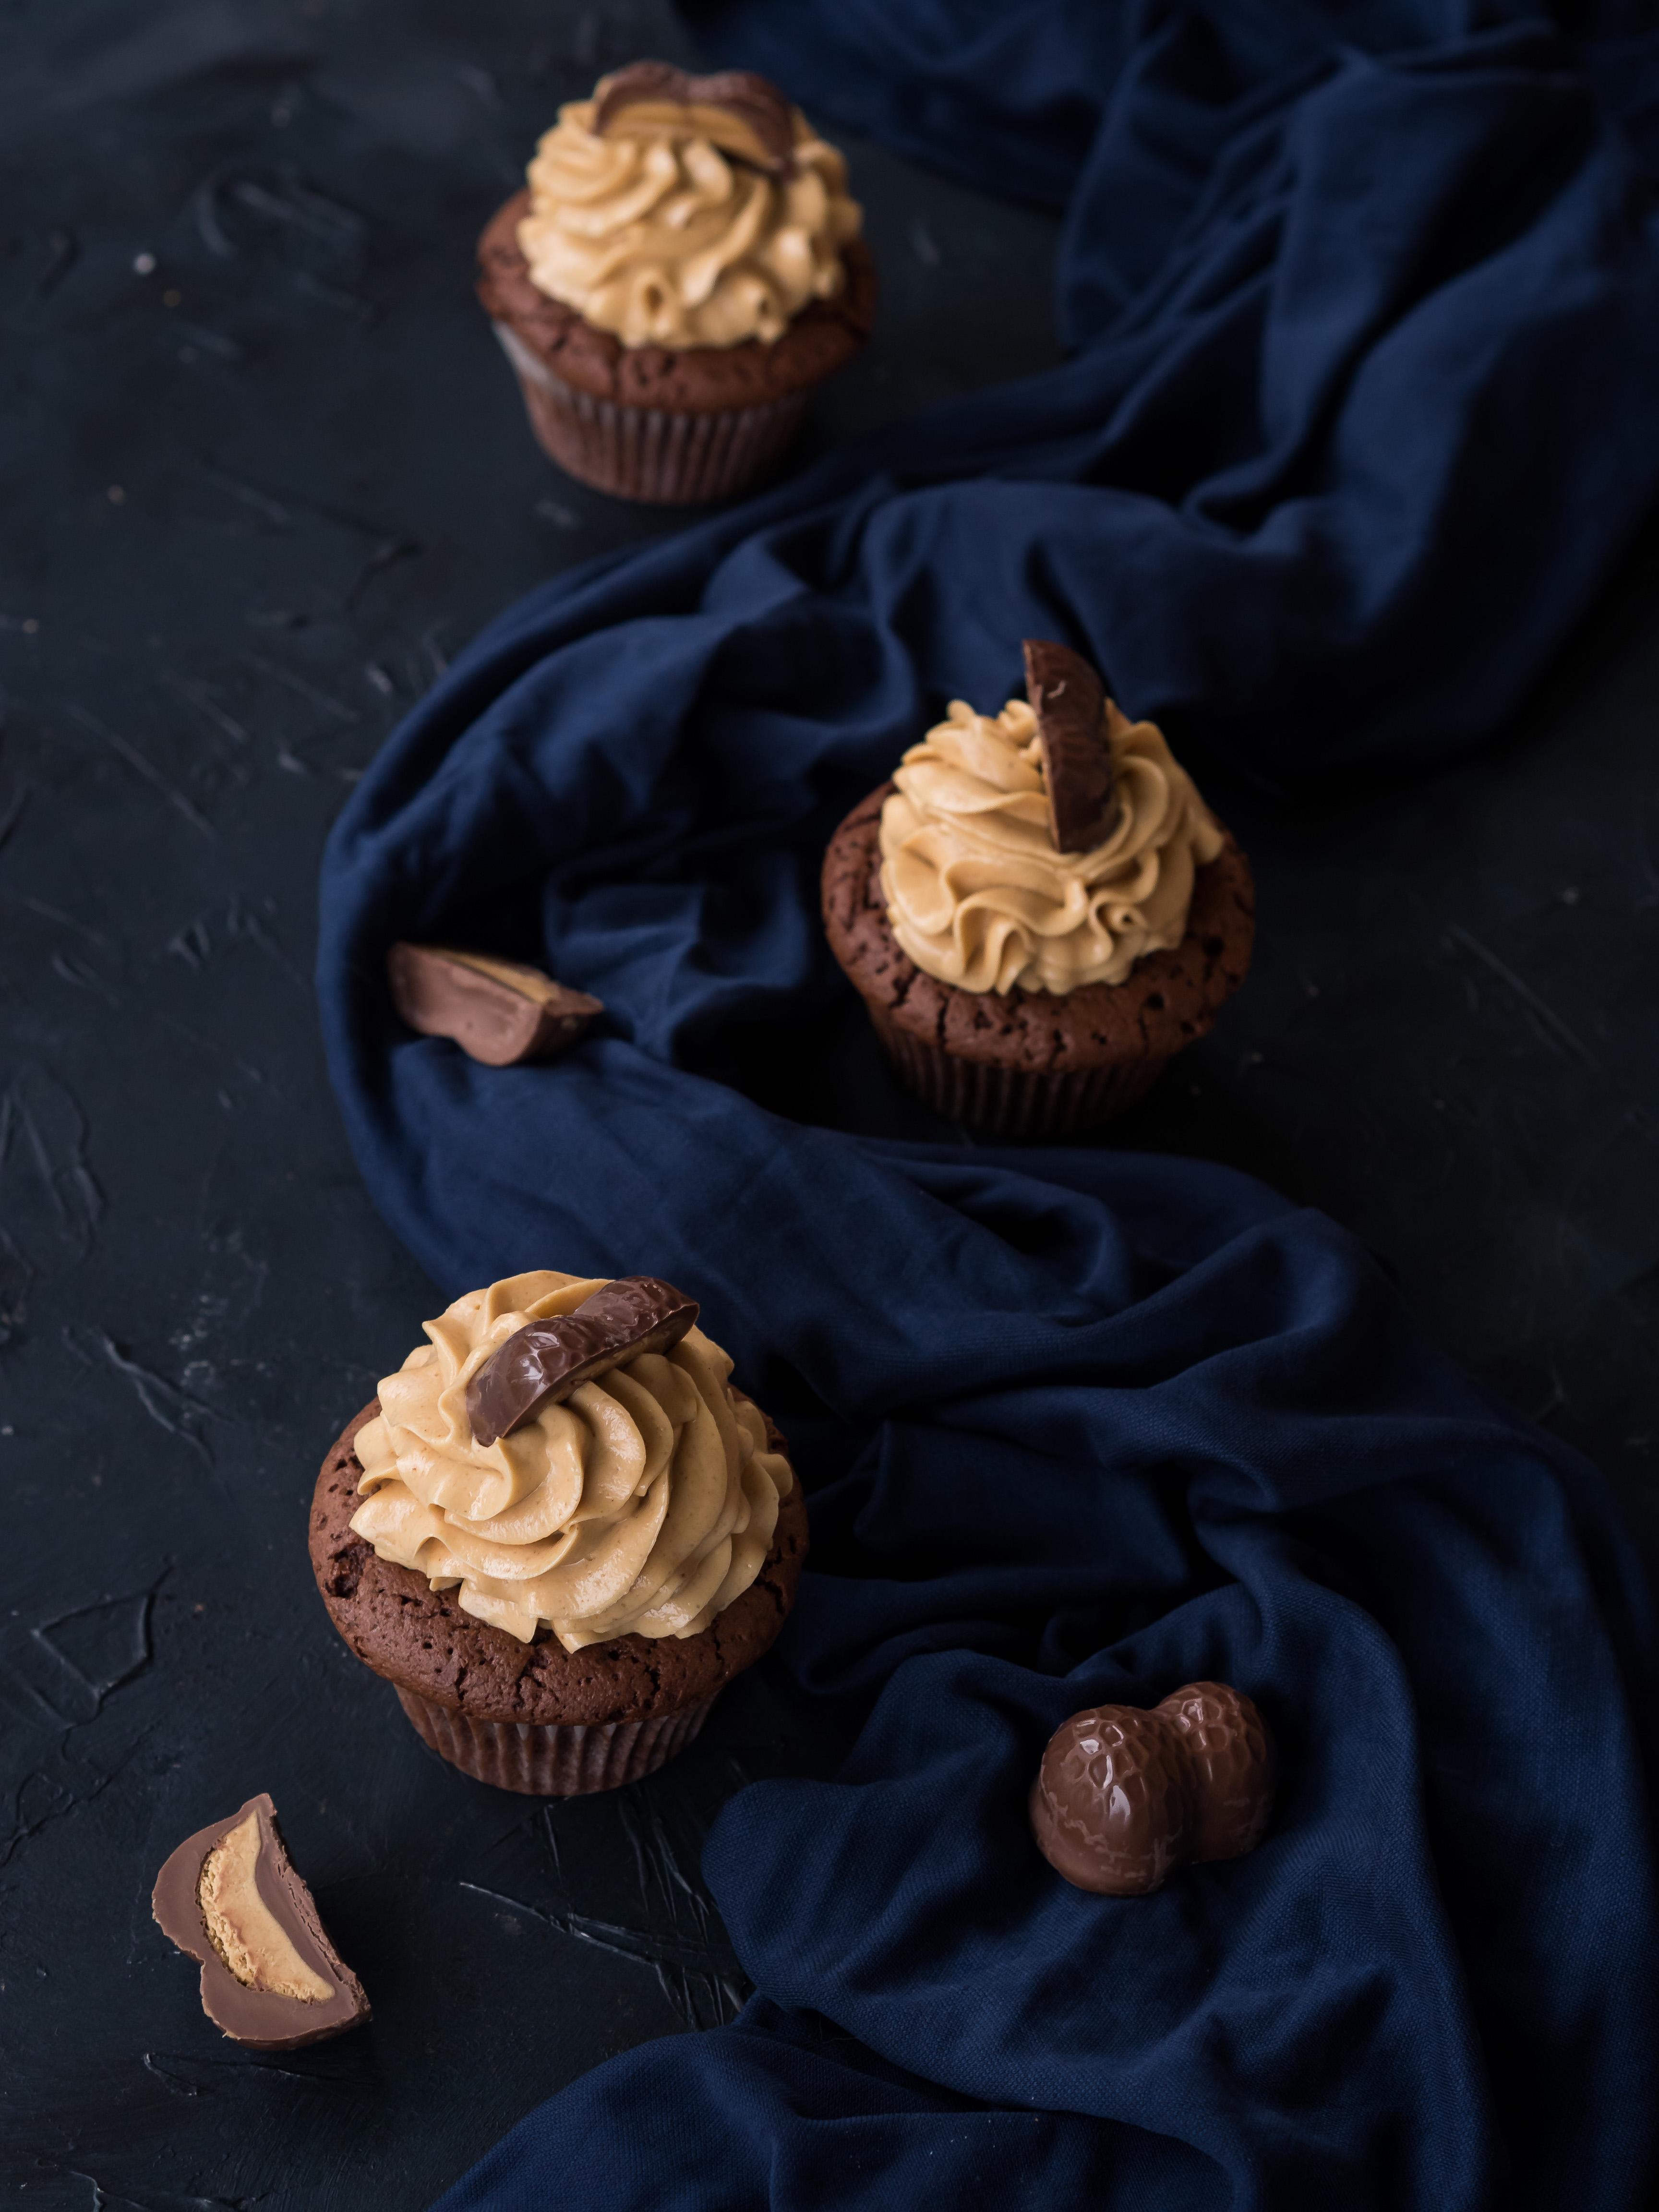 Peanutbutter Chocolate Cupcakes